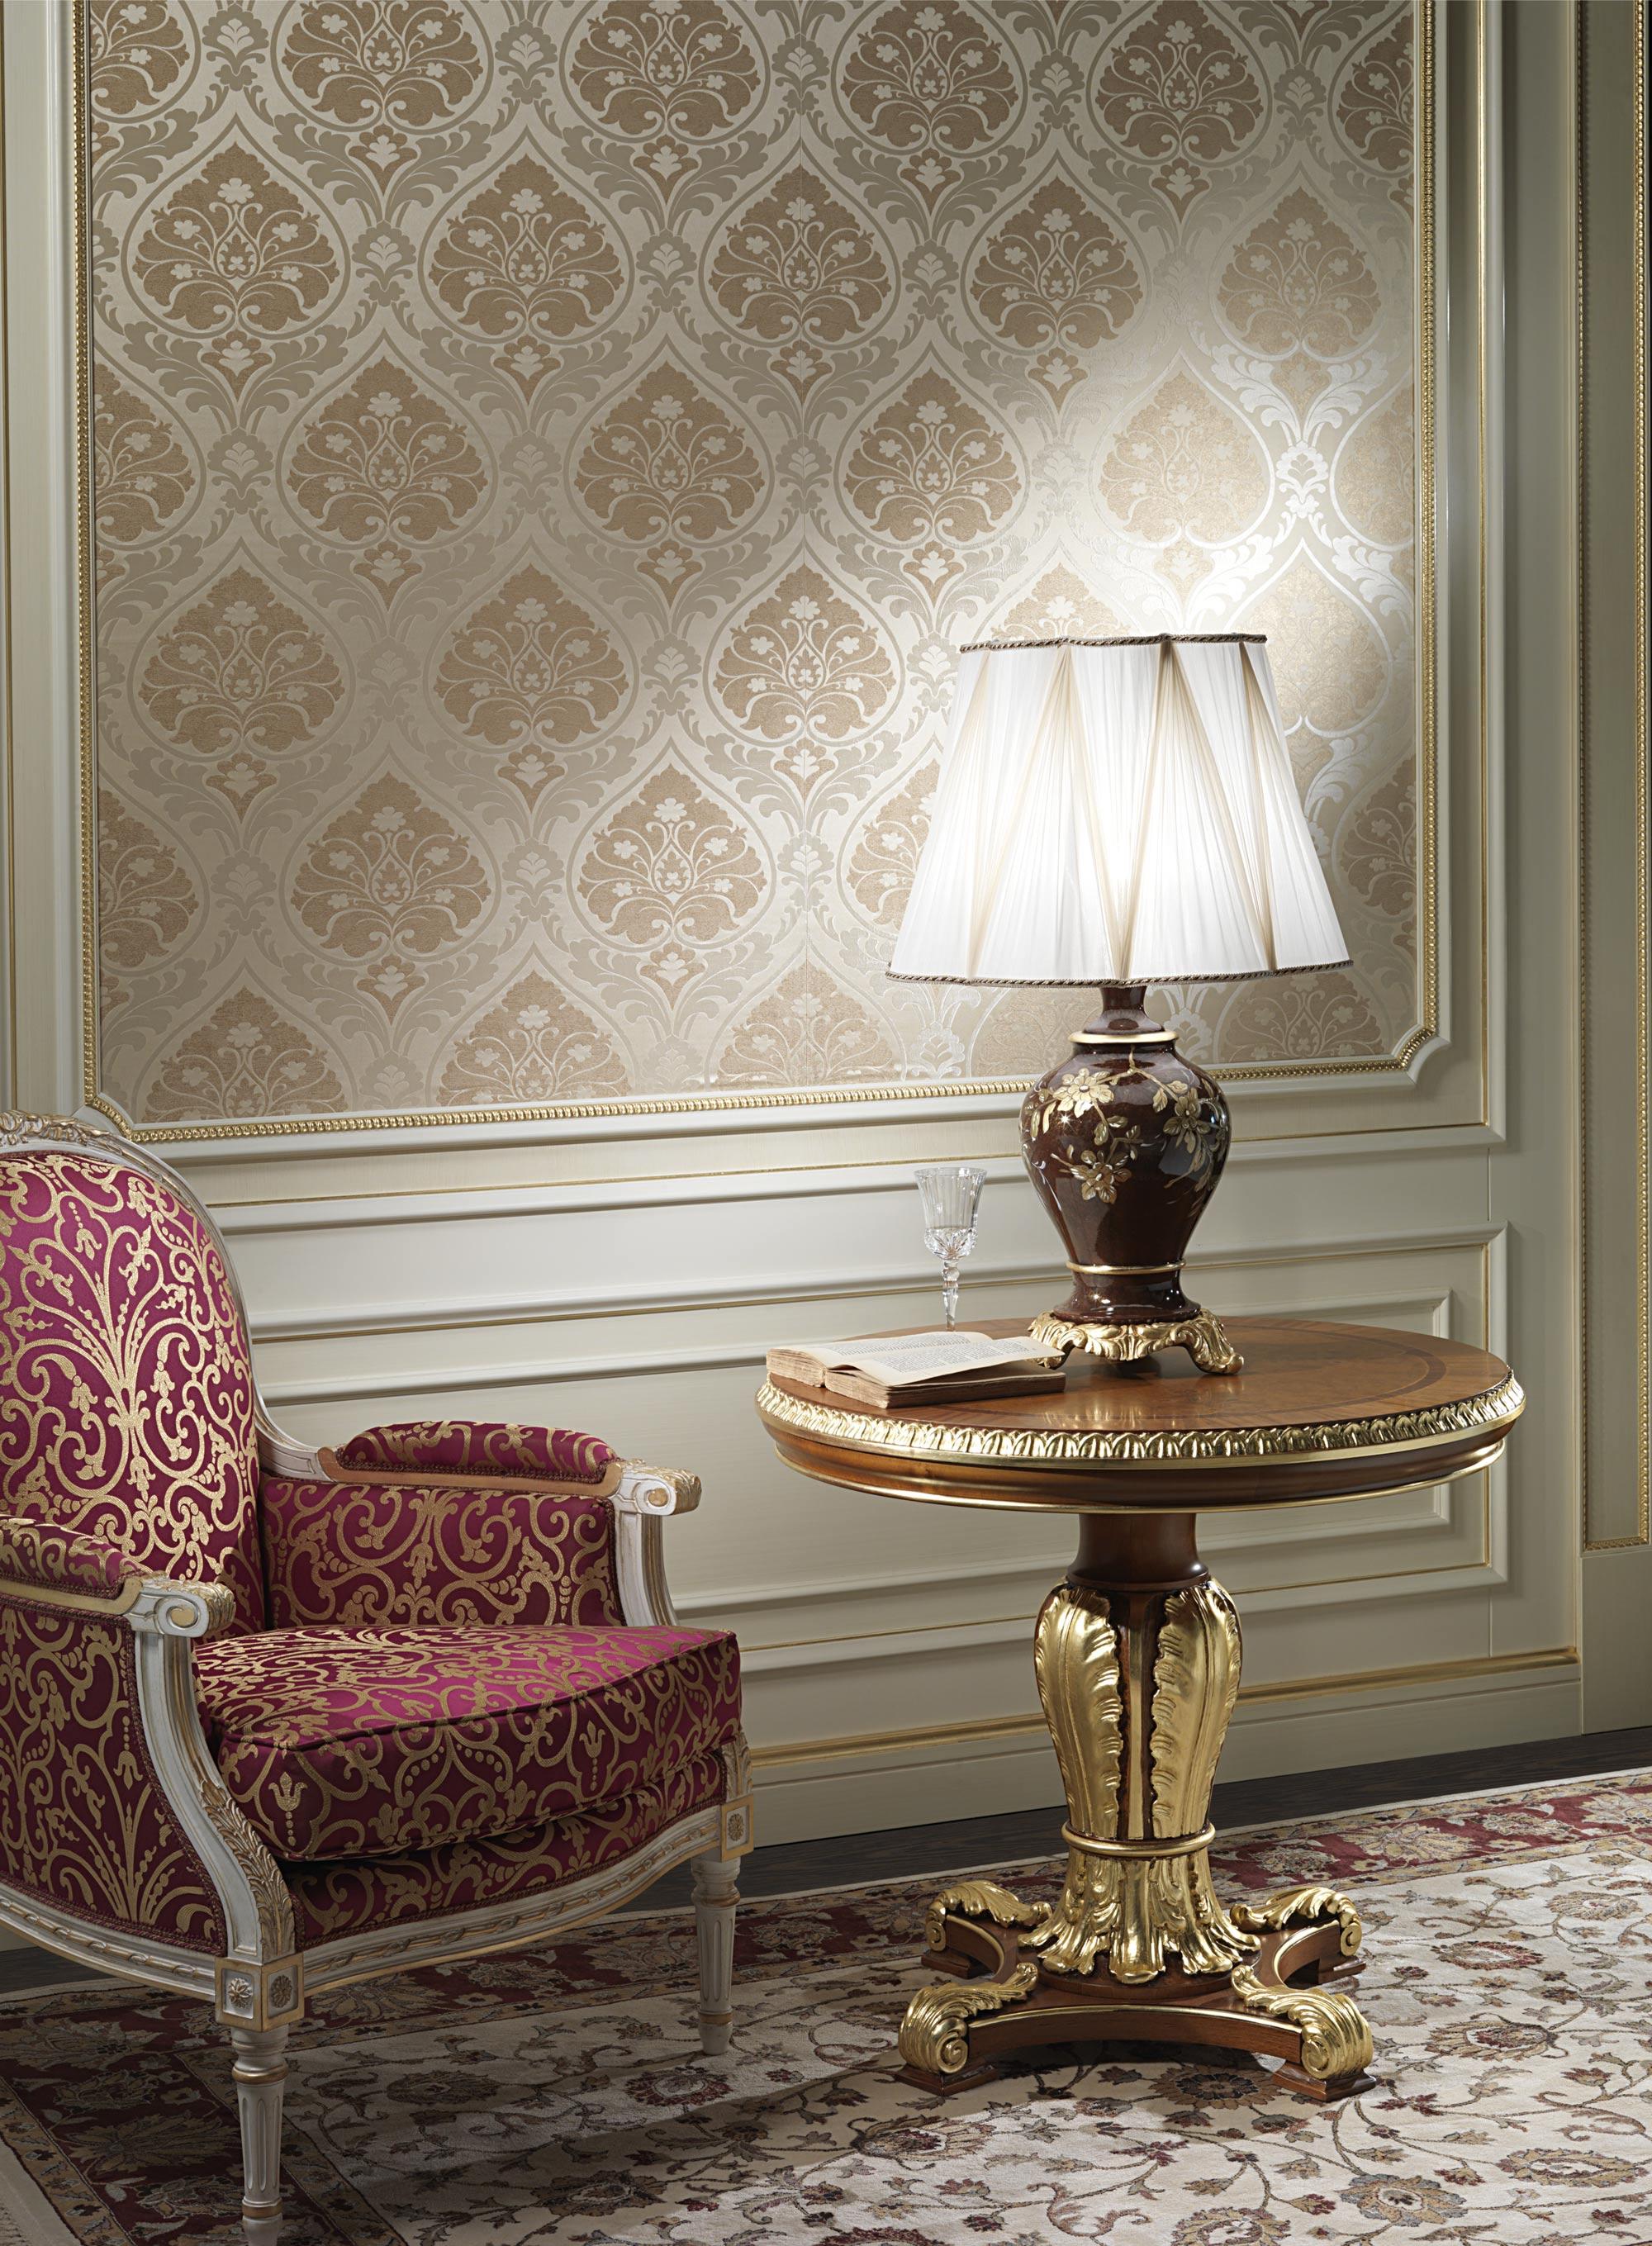 Классическая настольная лампа с белым абажуром